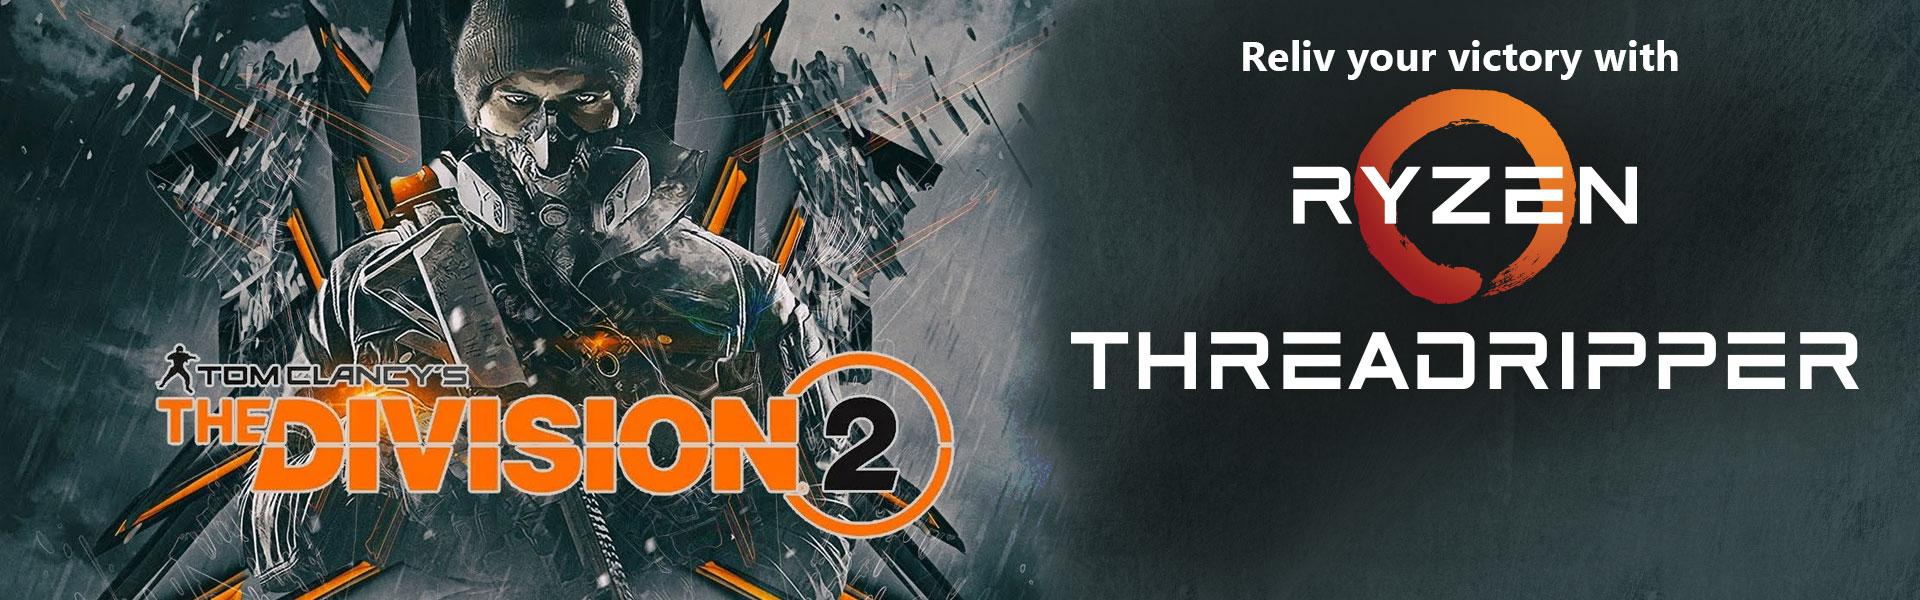 AMD Ryzen Threadripper - Gaming PCs - ConsolekillerPc